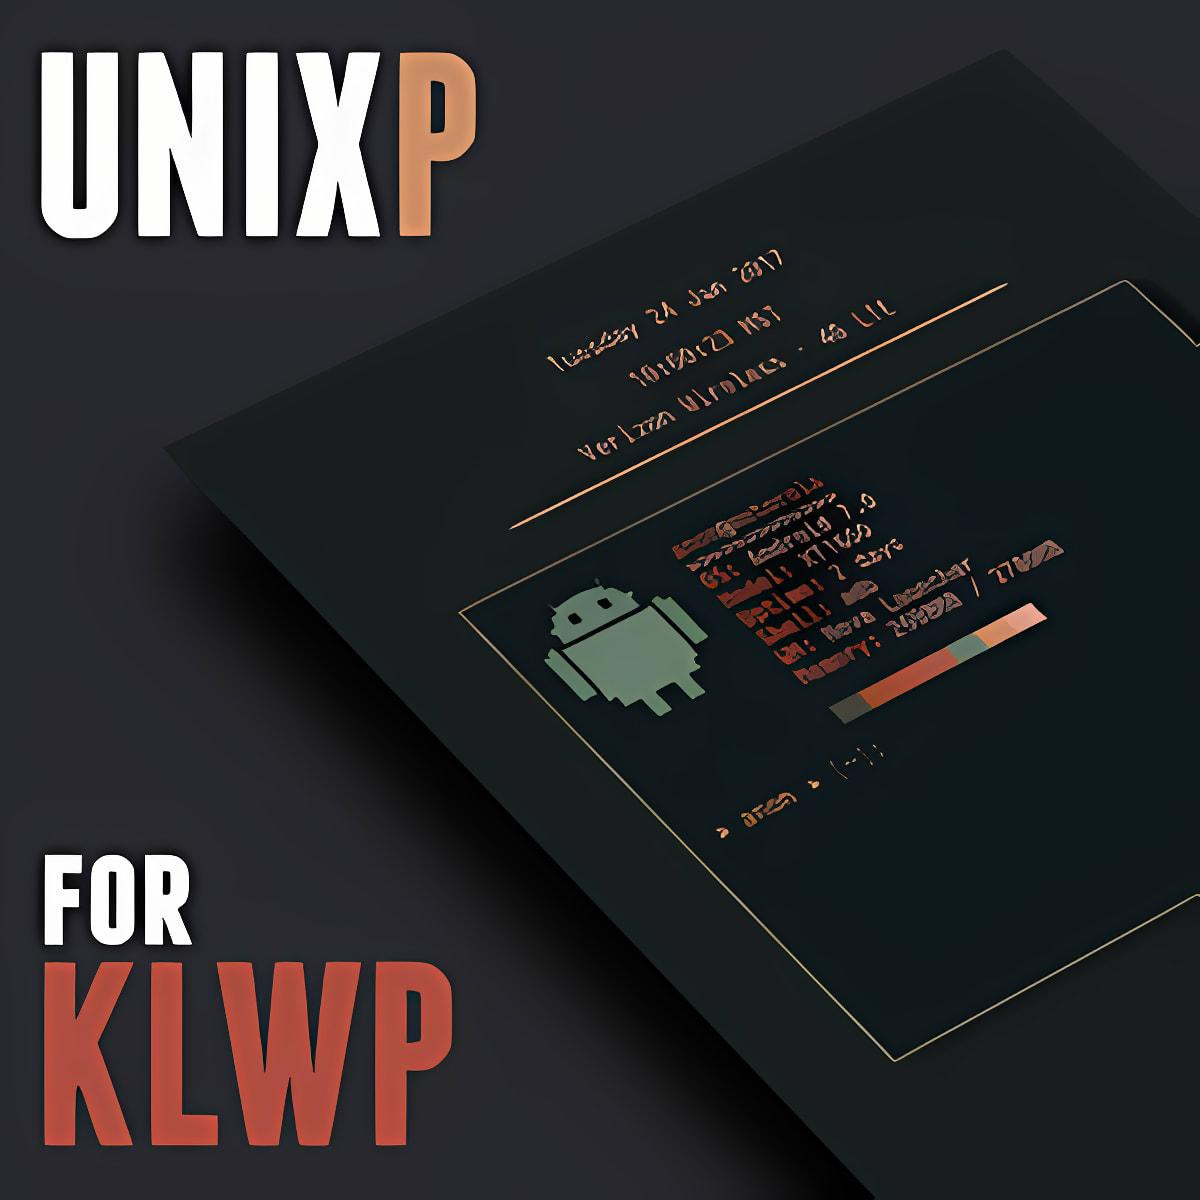 UnixP for KLWP